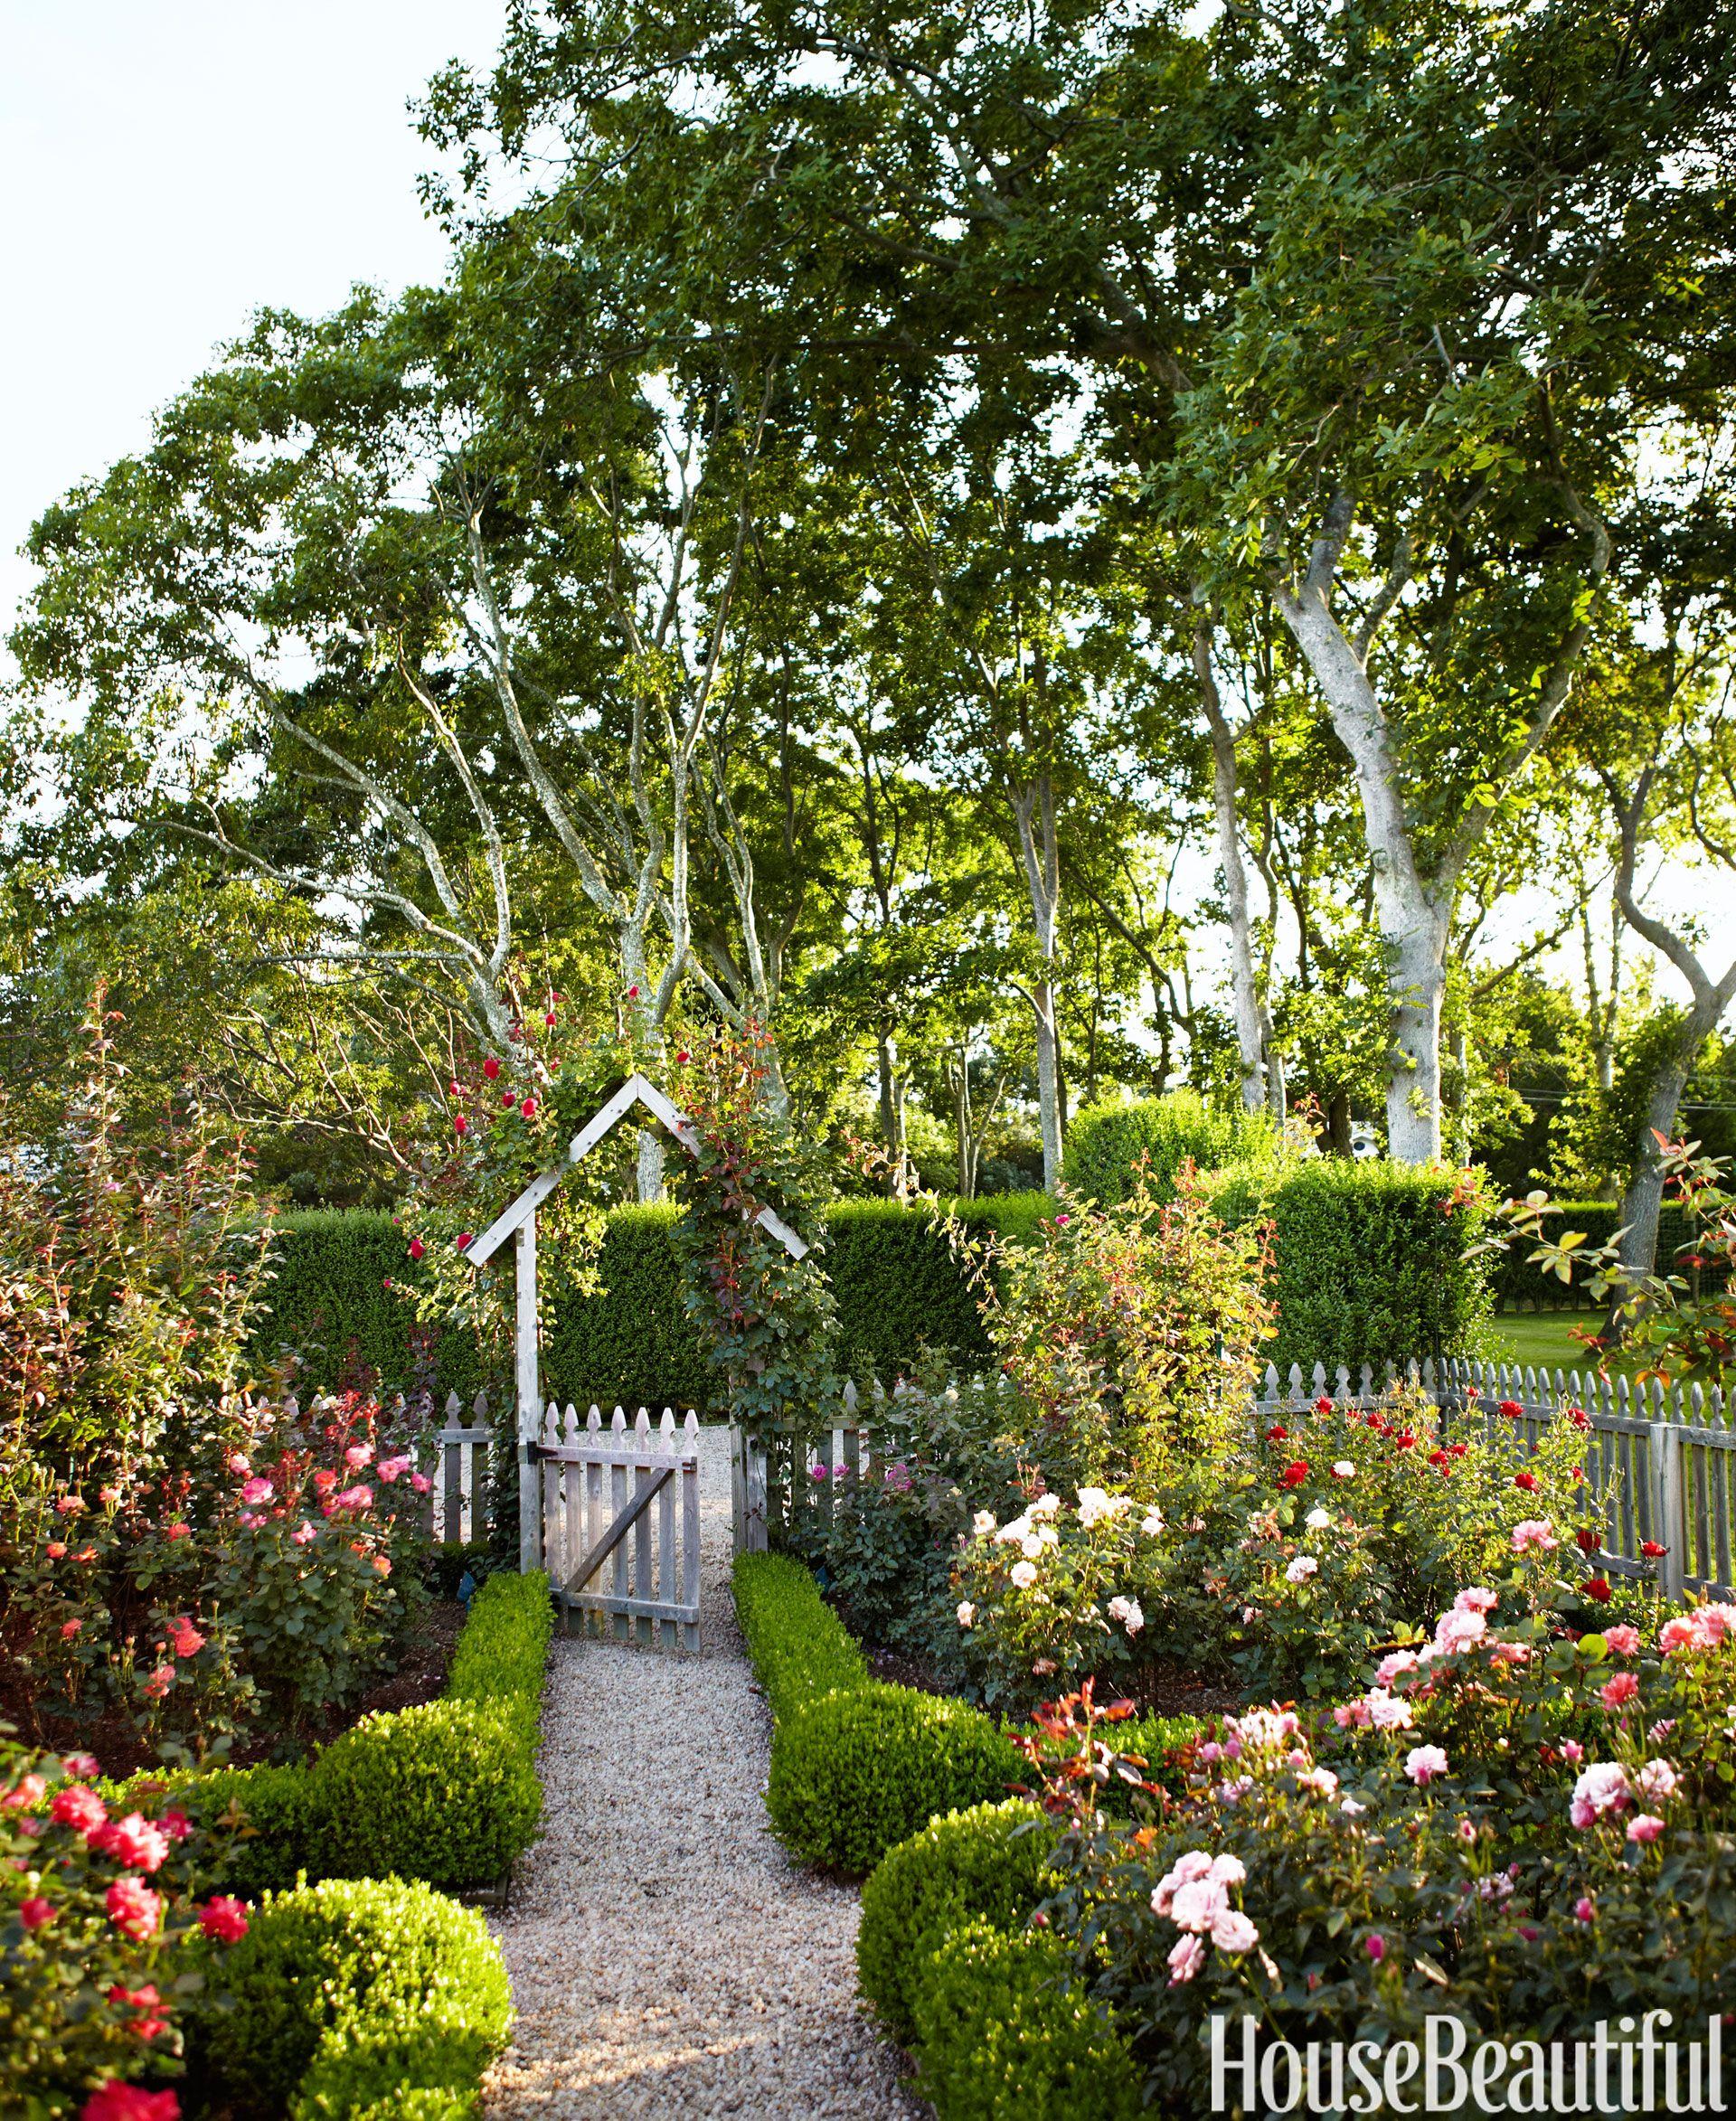 Amazing Backyard Gardens 35 backyard design ideas - beautiful yard inspiration pictures